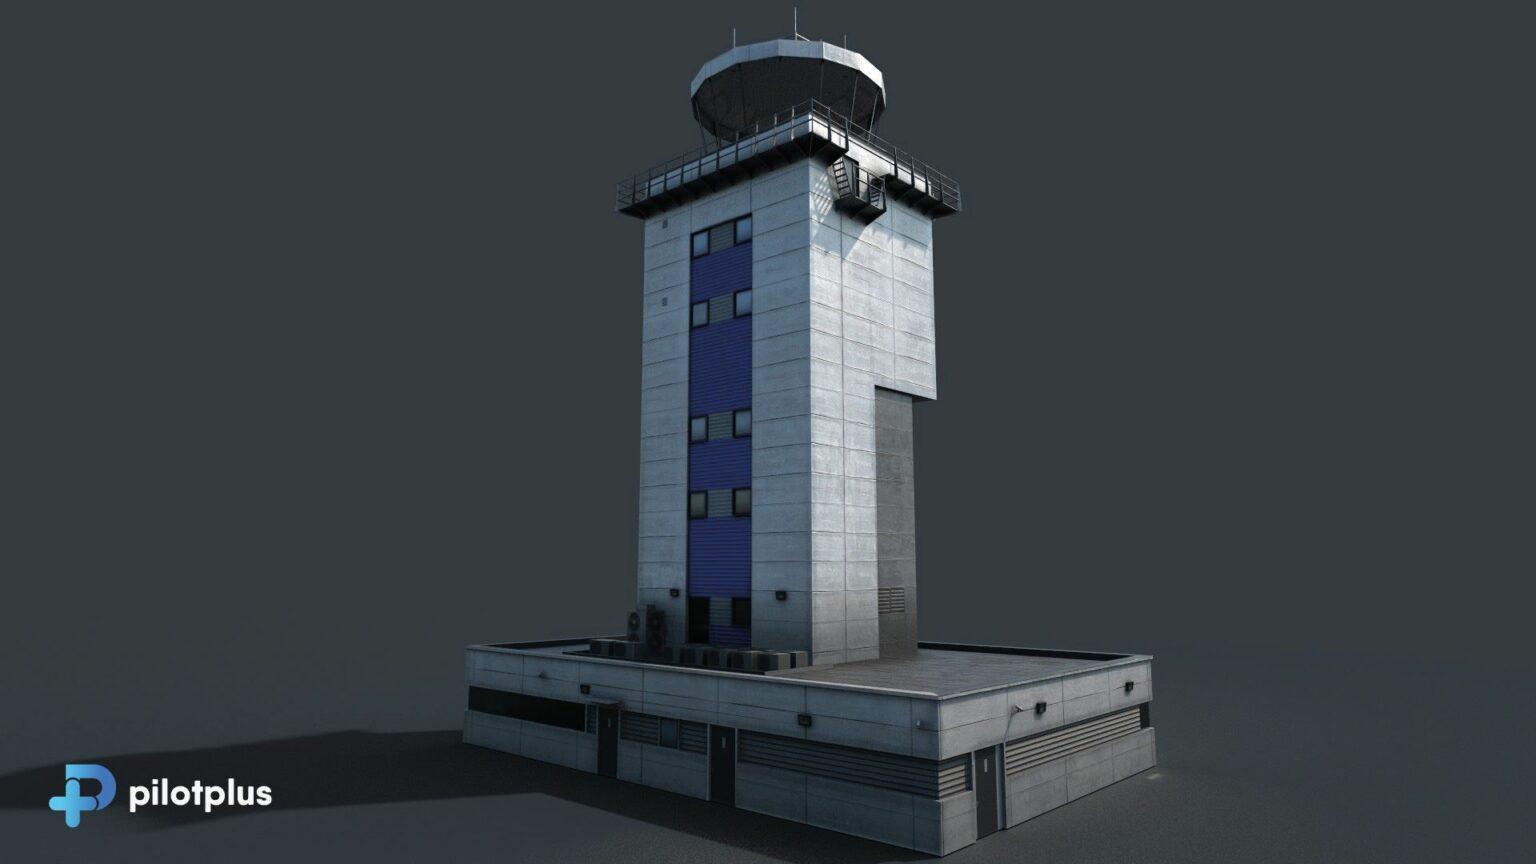 pilotplus_Southend (6)